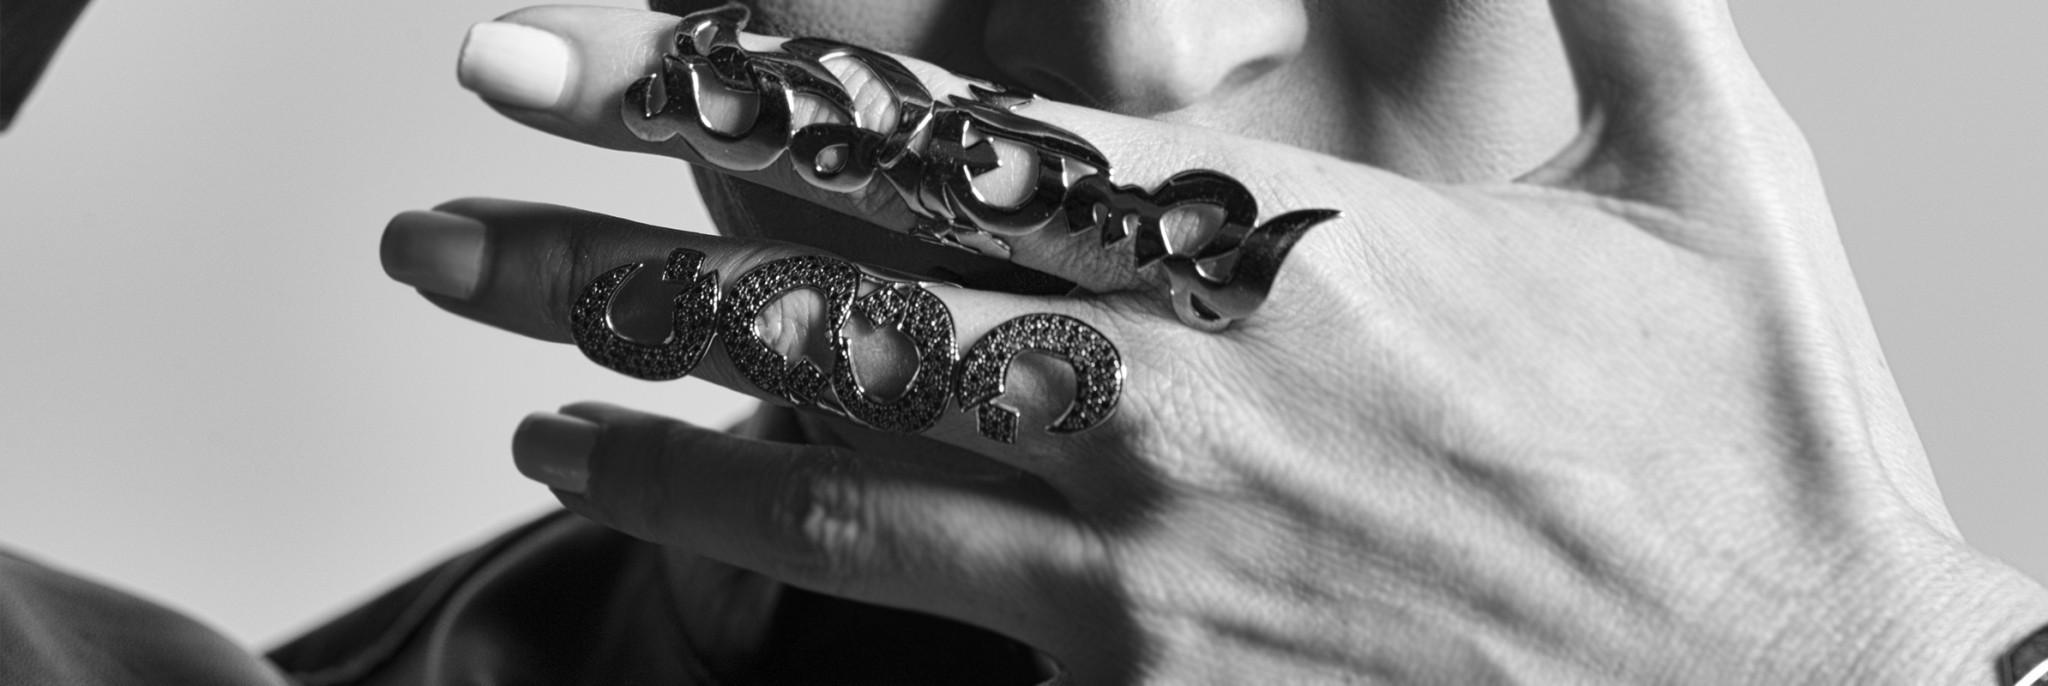 Bil Arabi's Beautiful New Collection